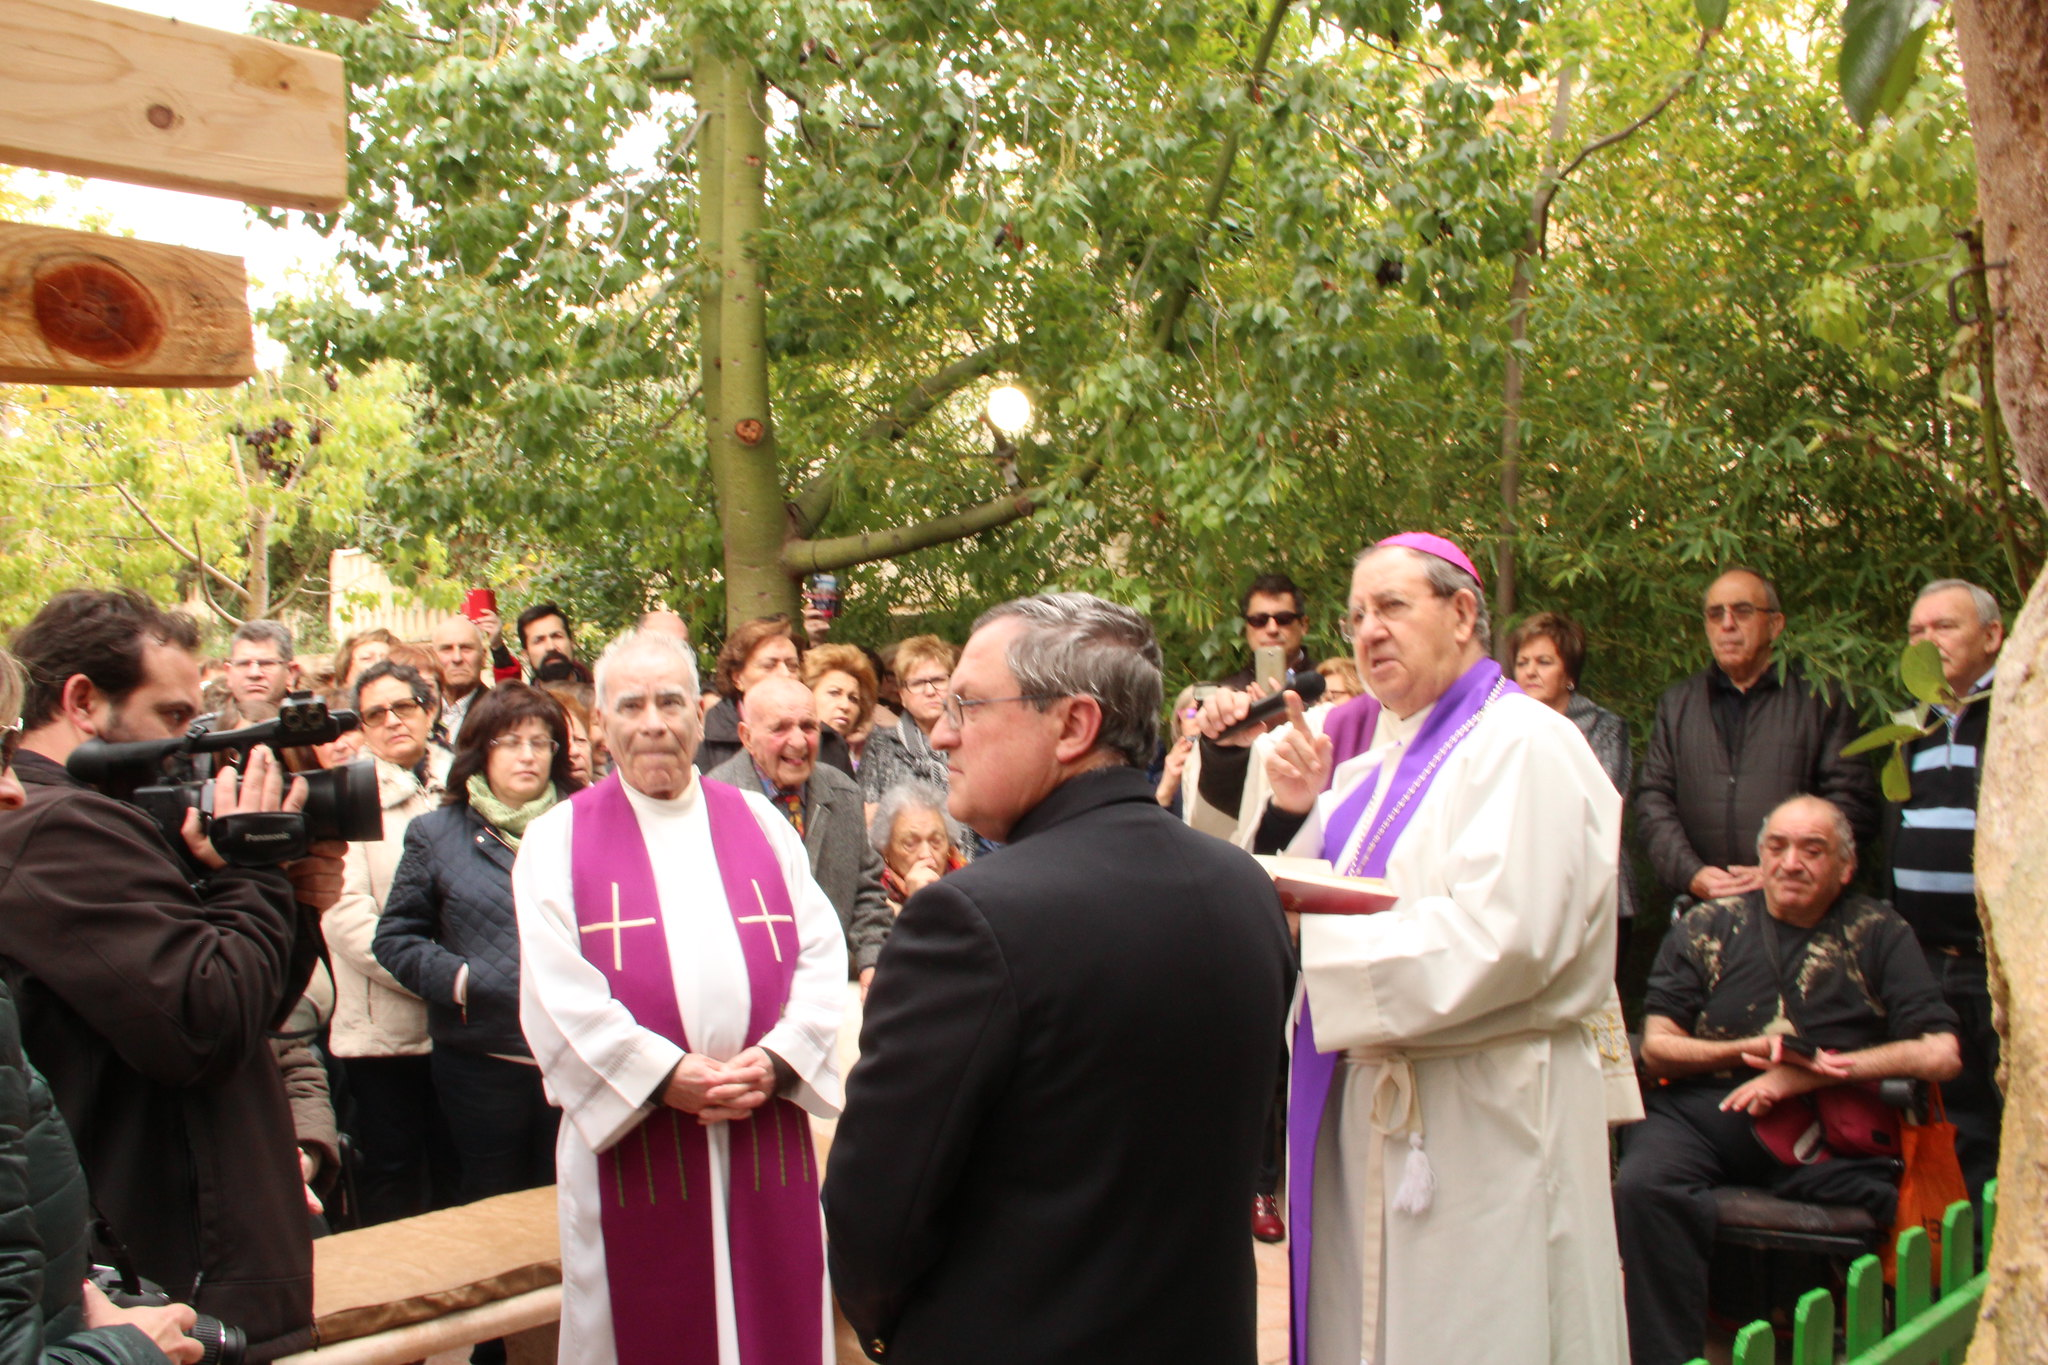 (2016-02-13) - Inauguración Virgen De Lourdes, La Molineta - Archivo La Molineta (074)